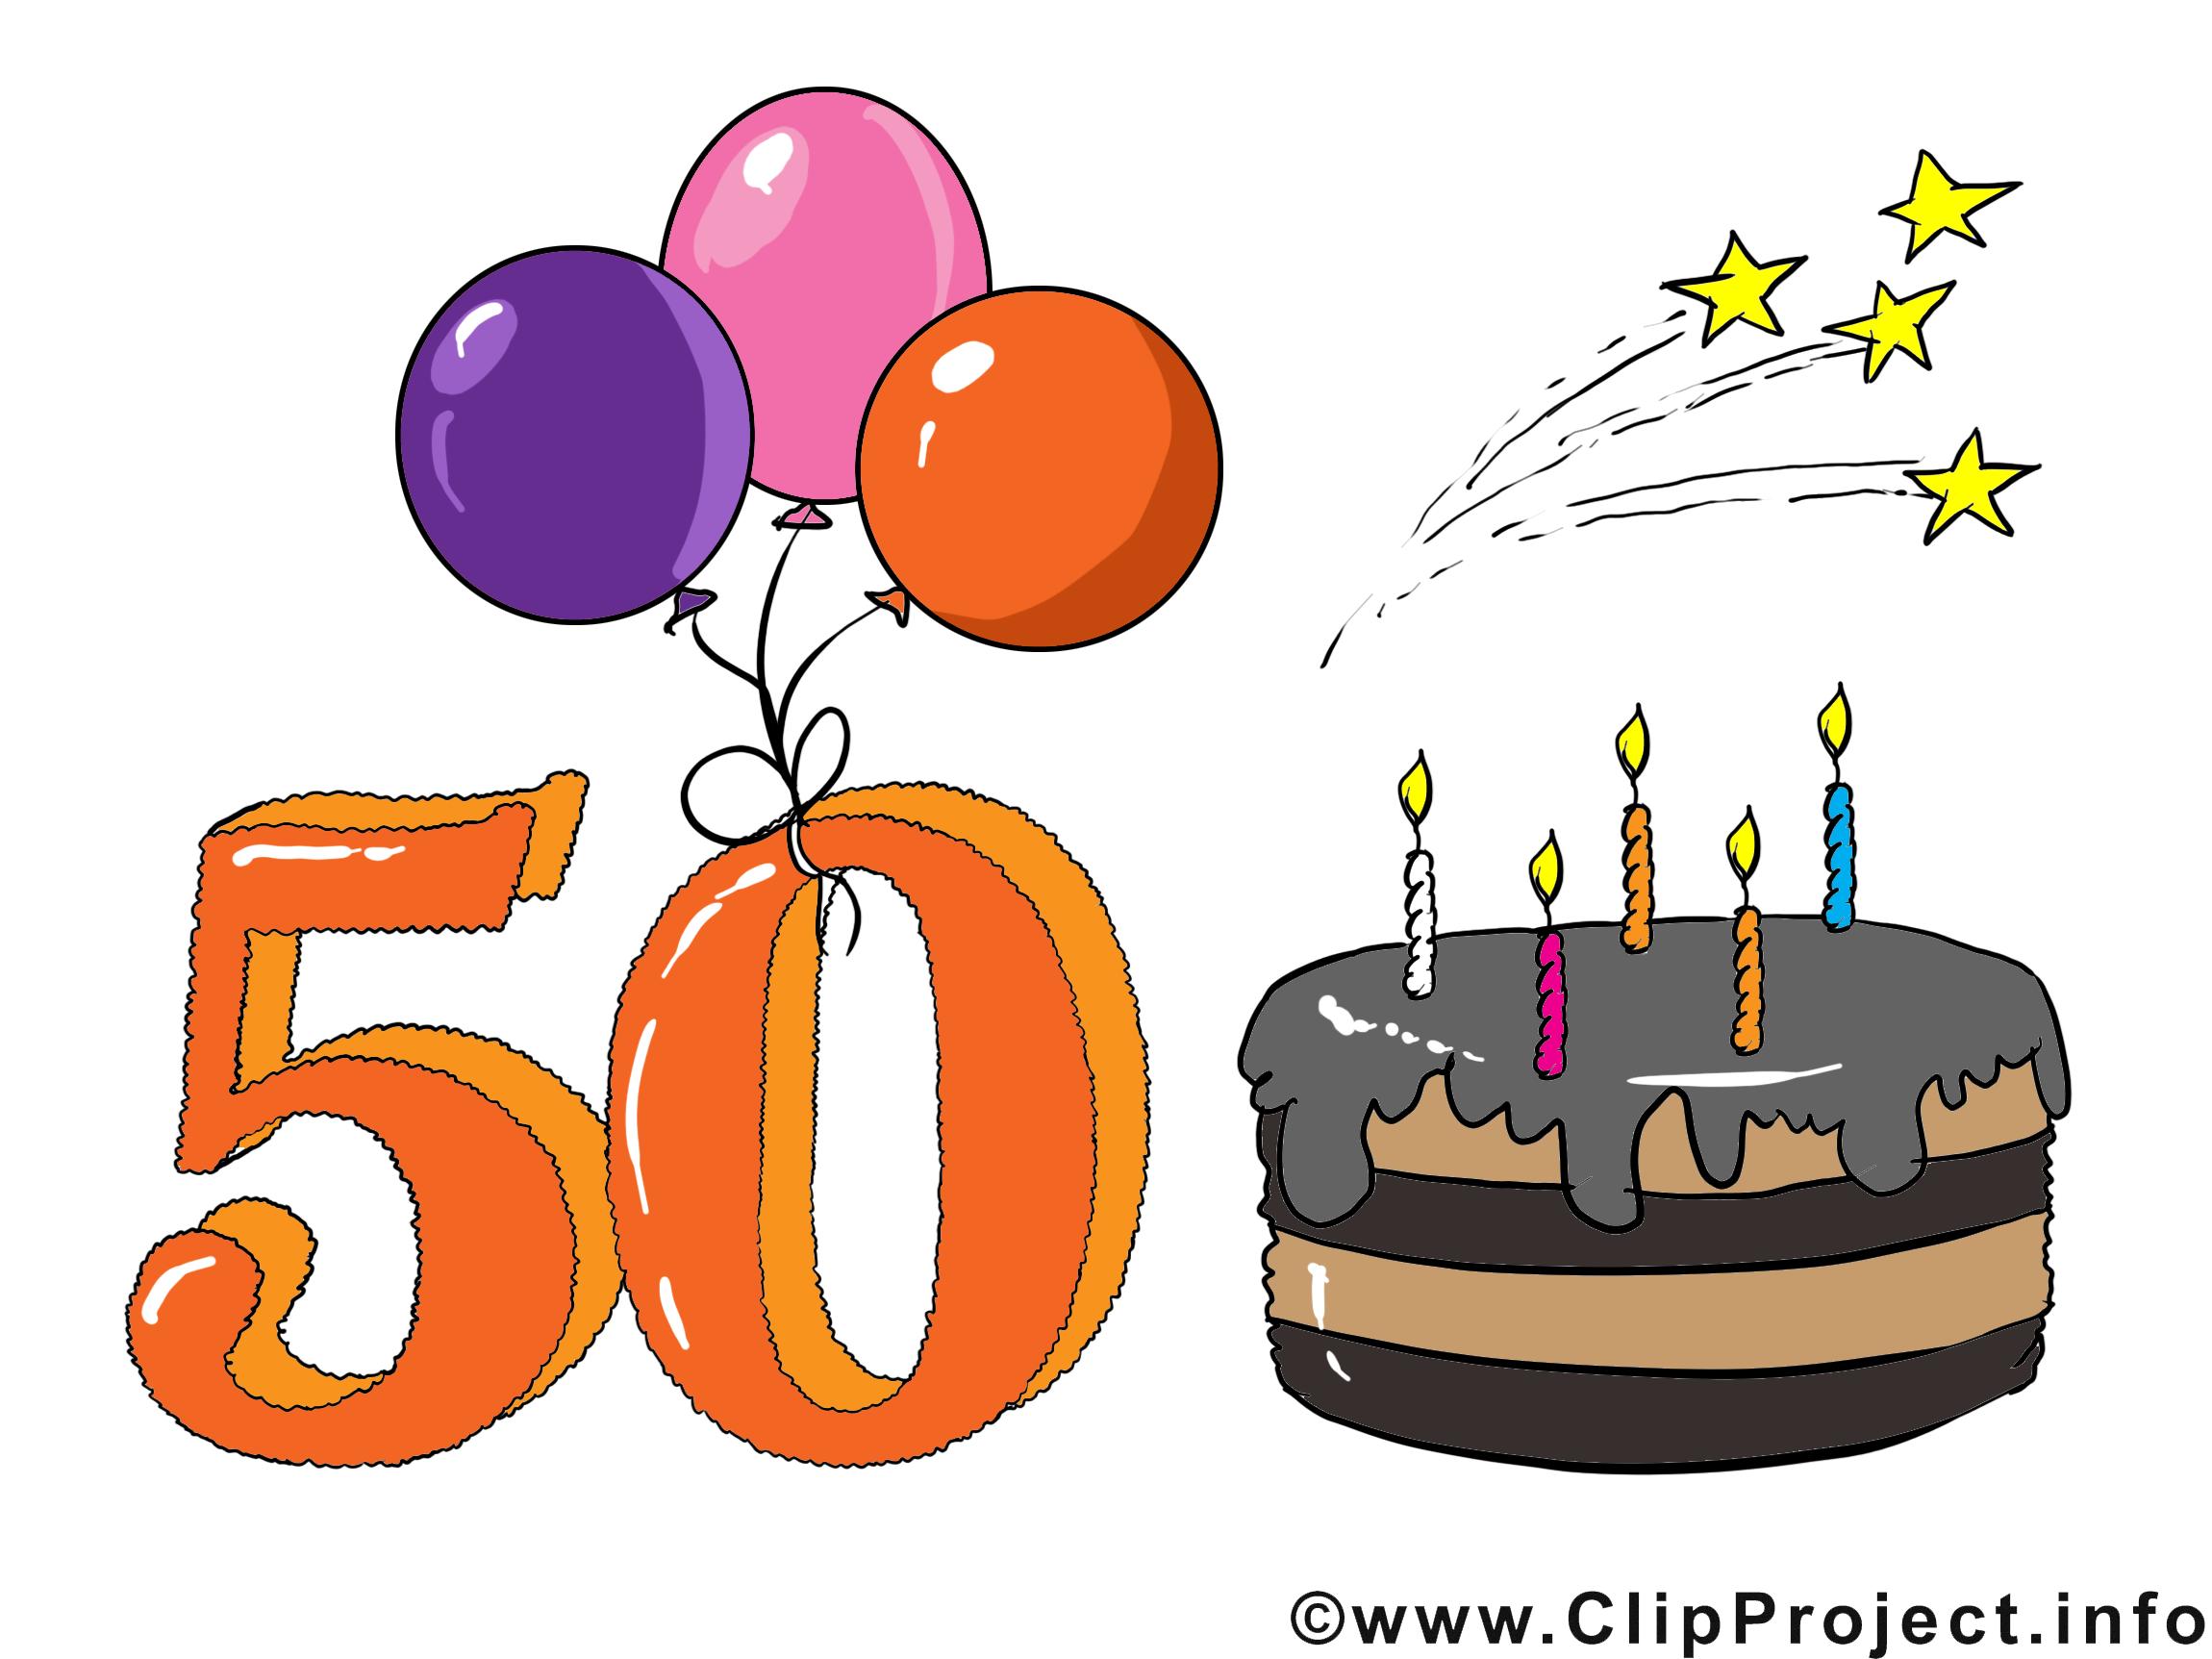 Clipart 50 geburtstag 15 » Clipart Station.